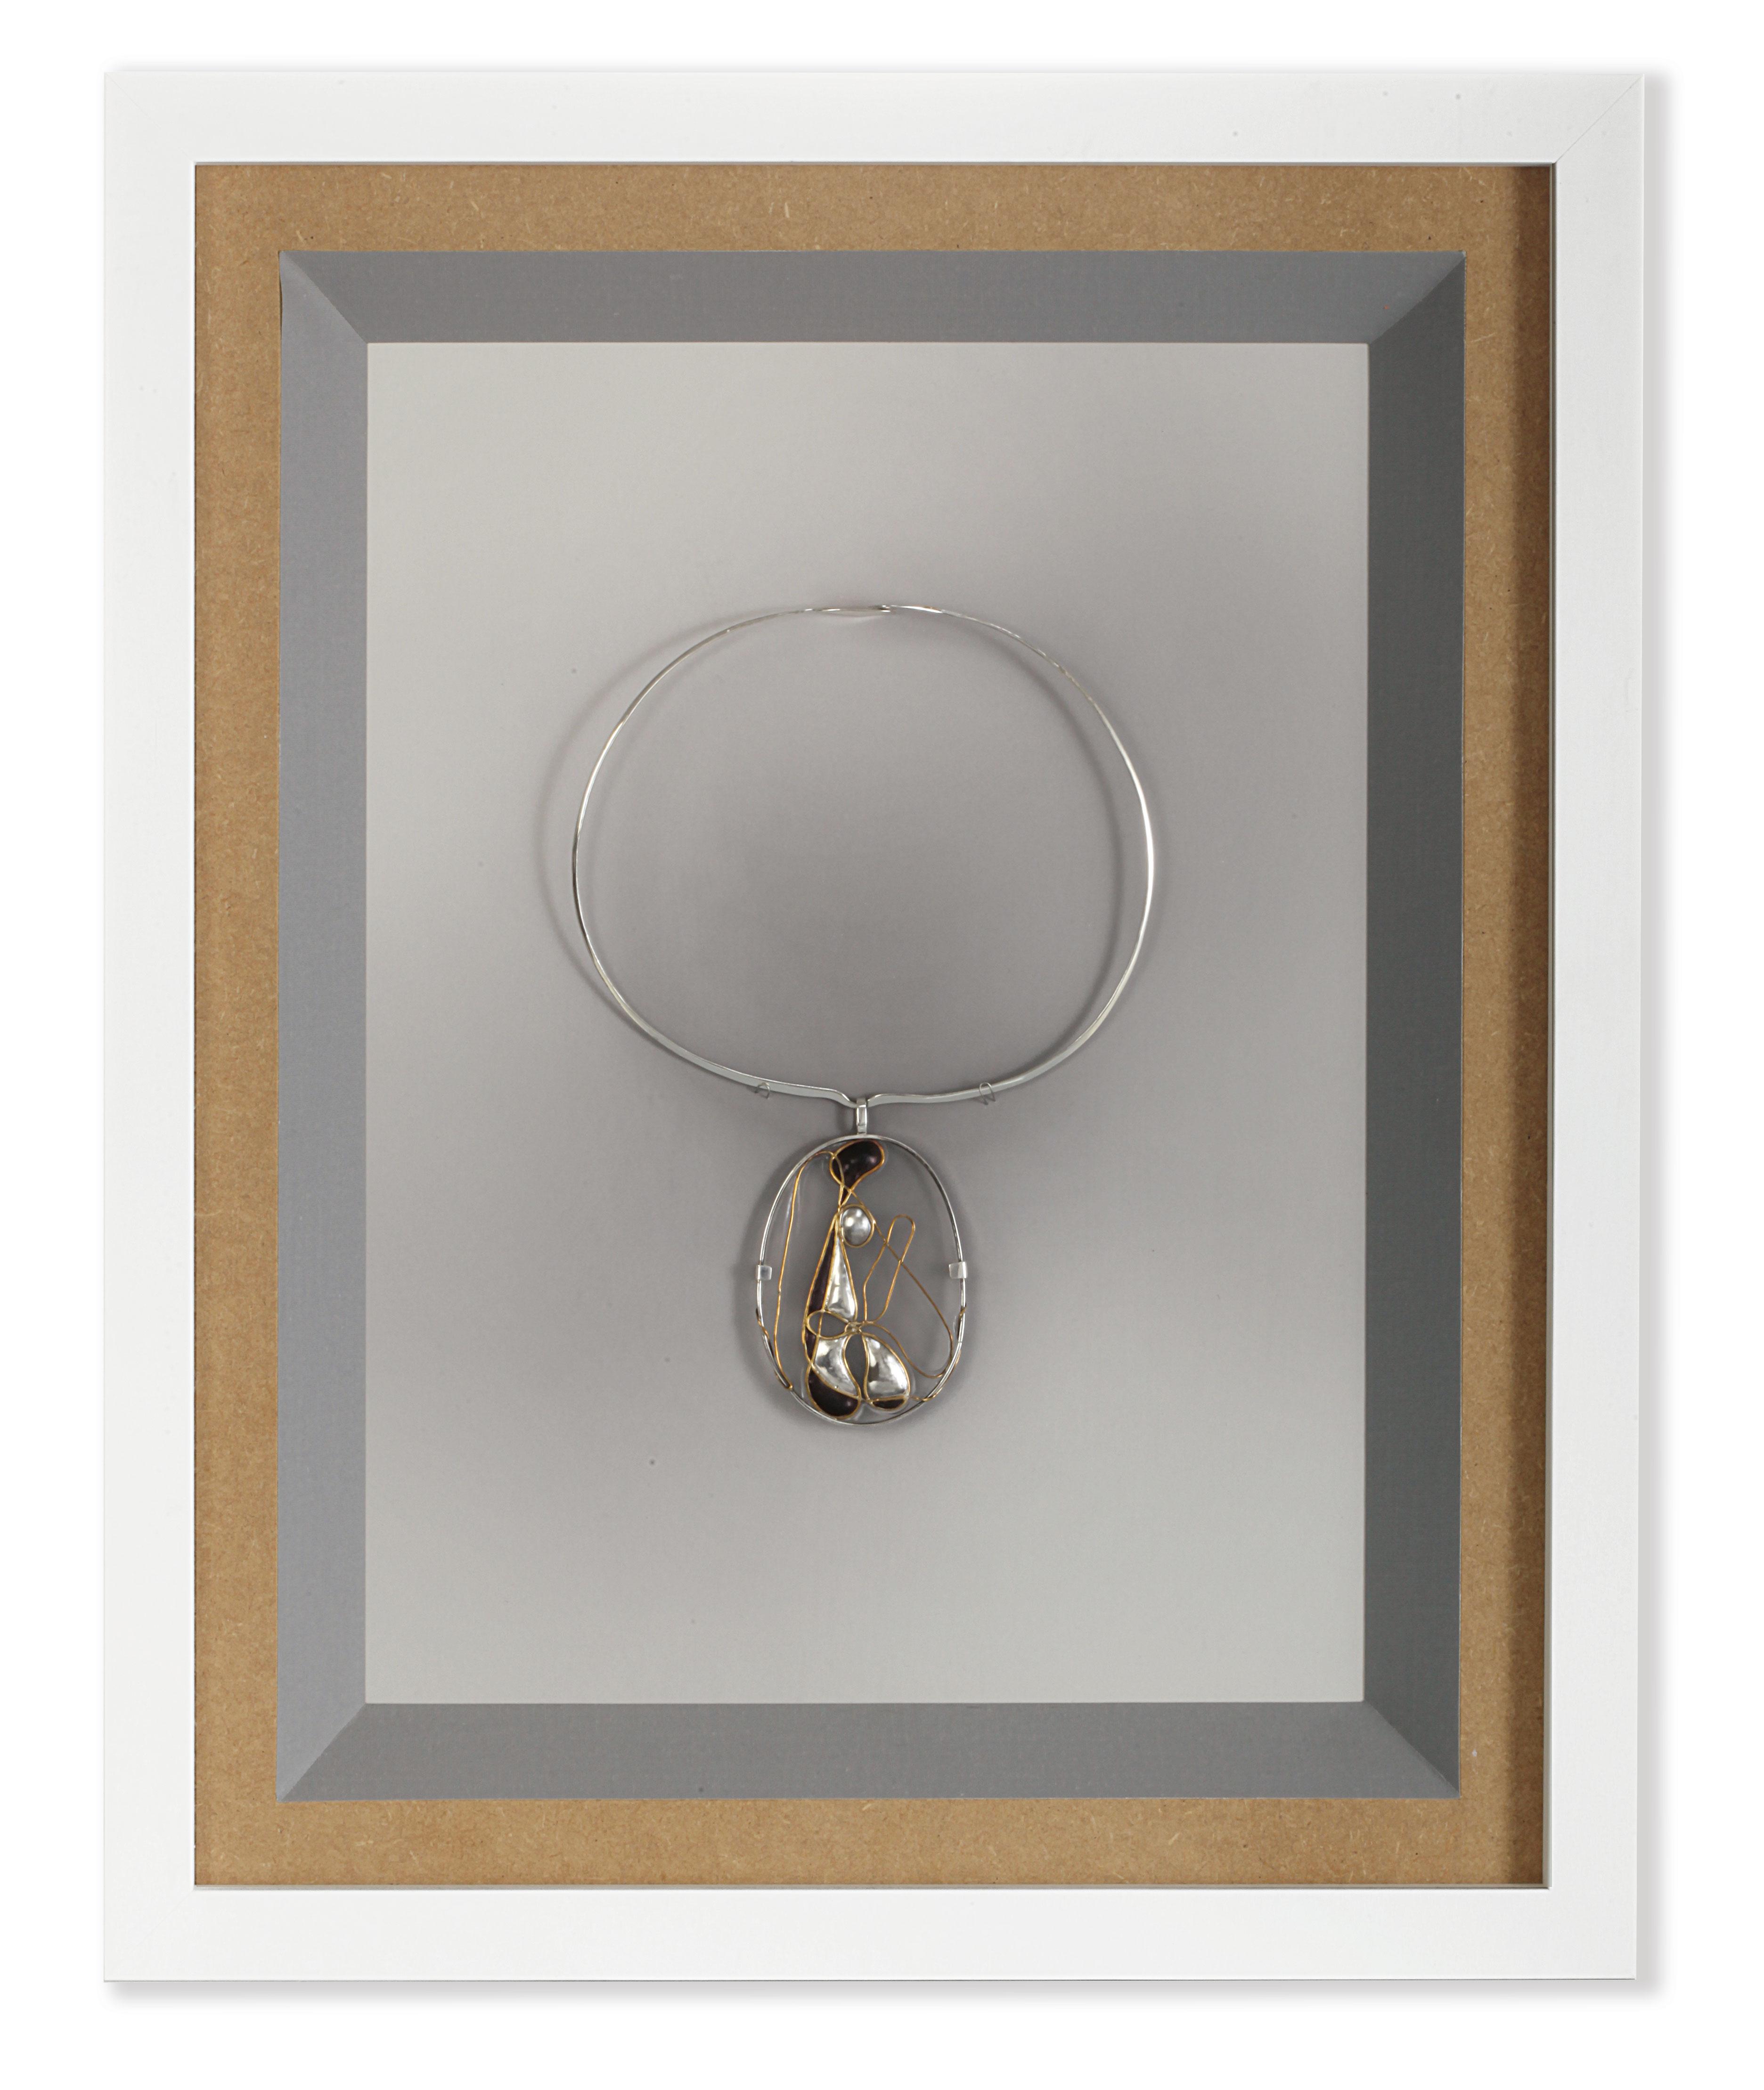 motherhood neckpice on frame